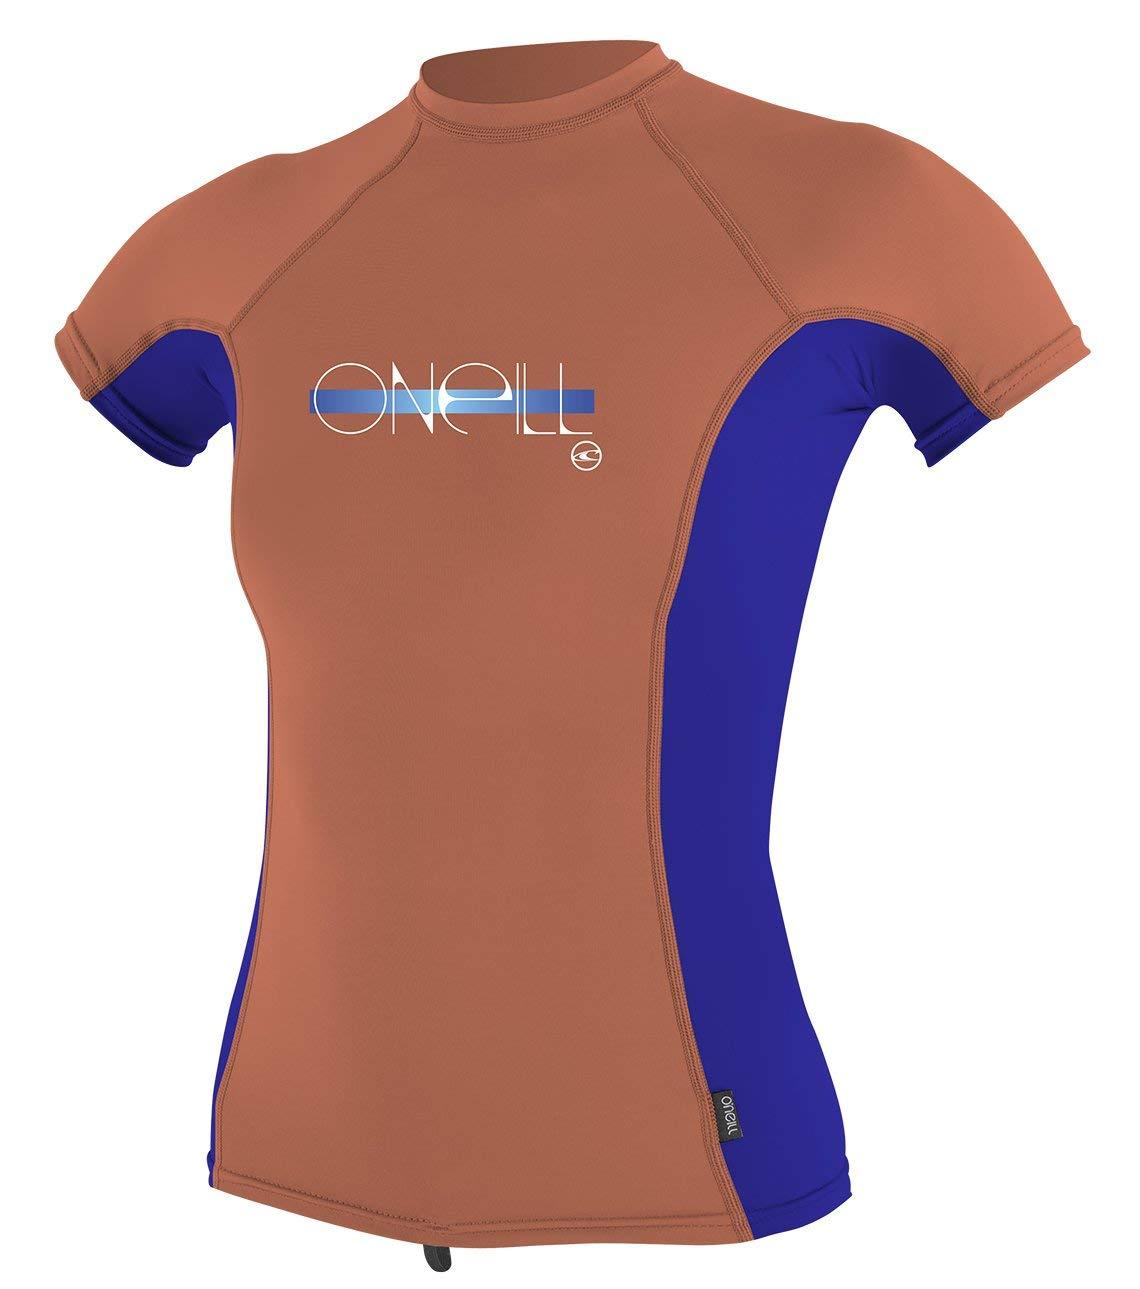 1656ea1edf1 Get Quotations · O Neill Girls Premium Skins UPF 50+ Short Sleeve Rash Guard